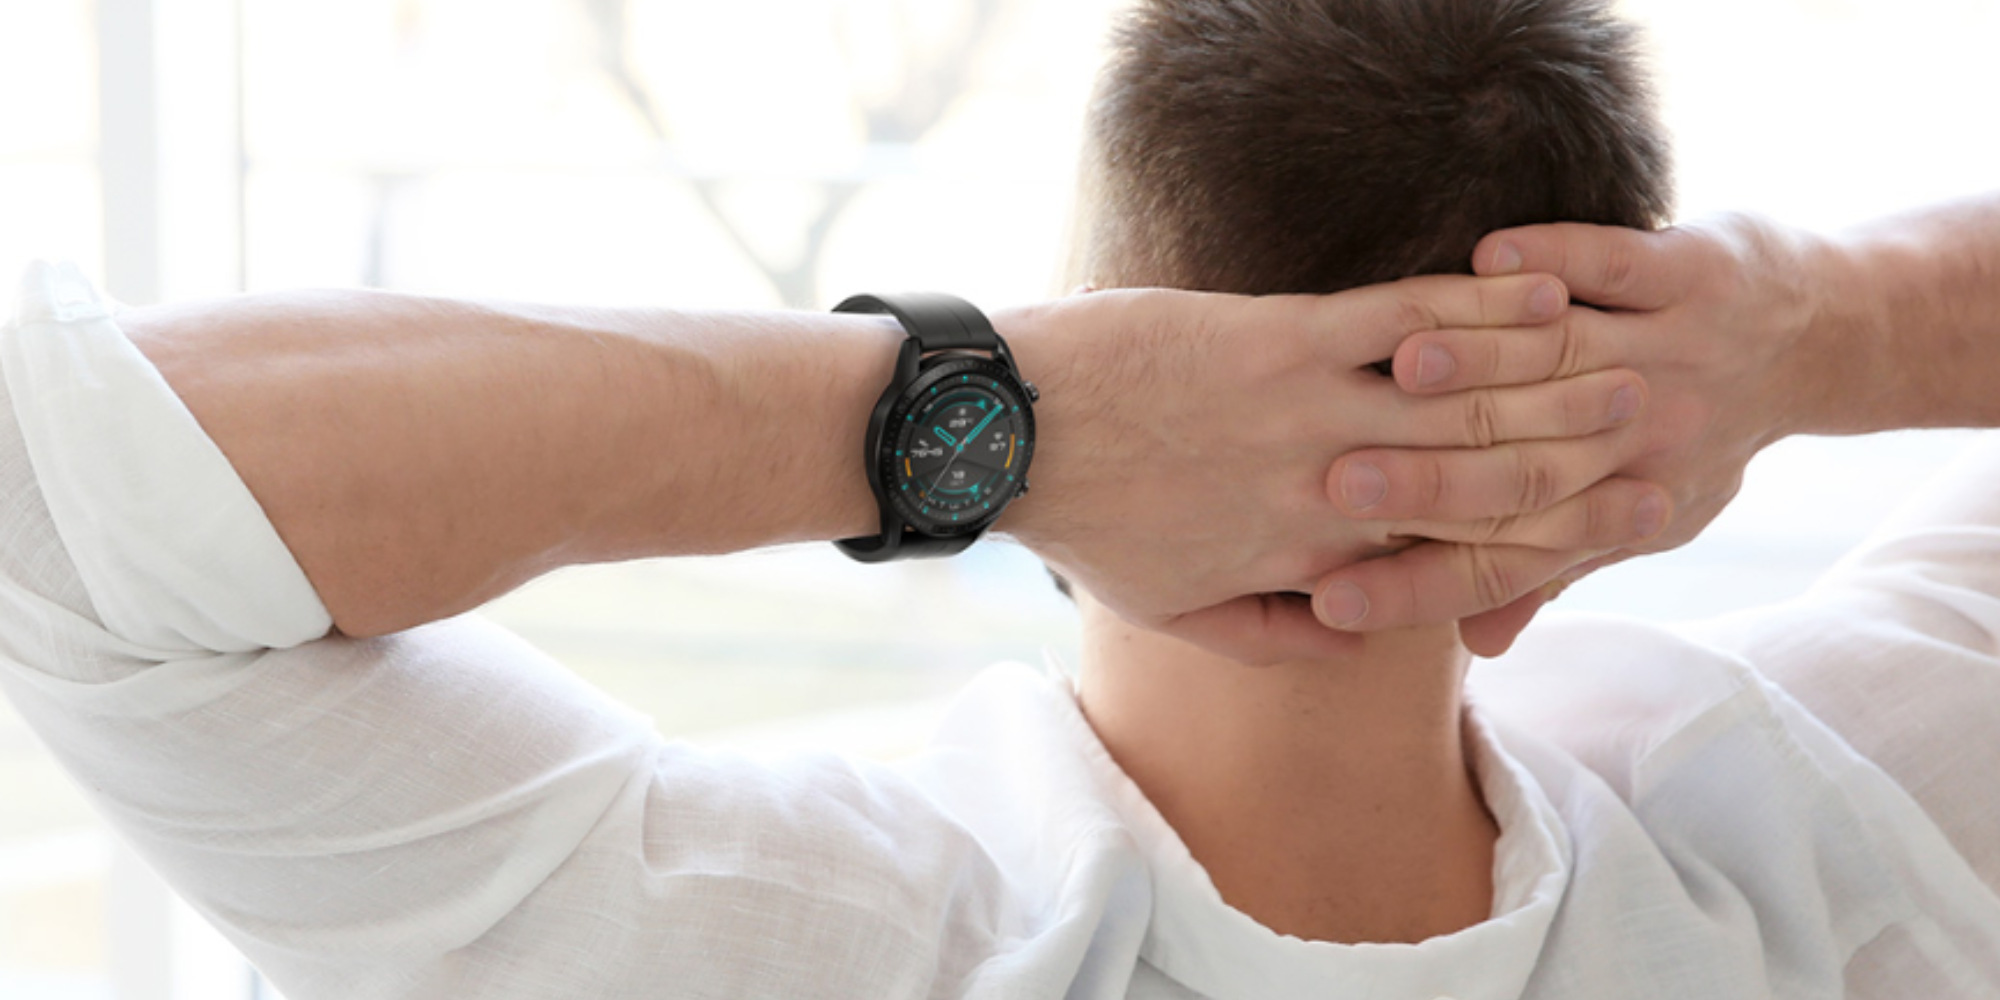 ساعة watch 2 sport huawei